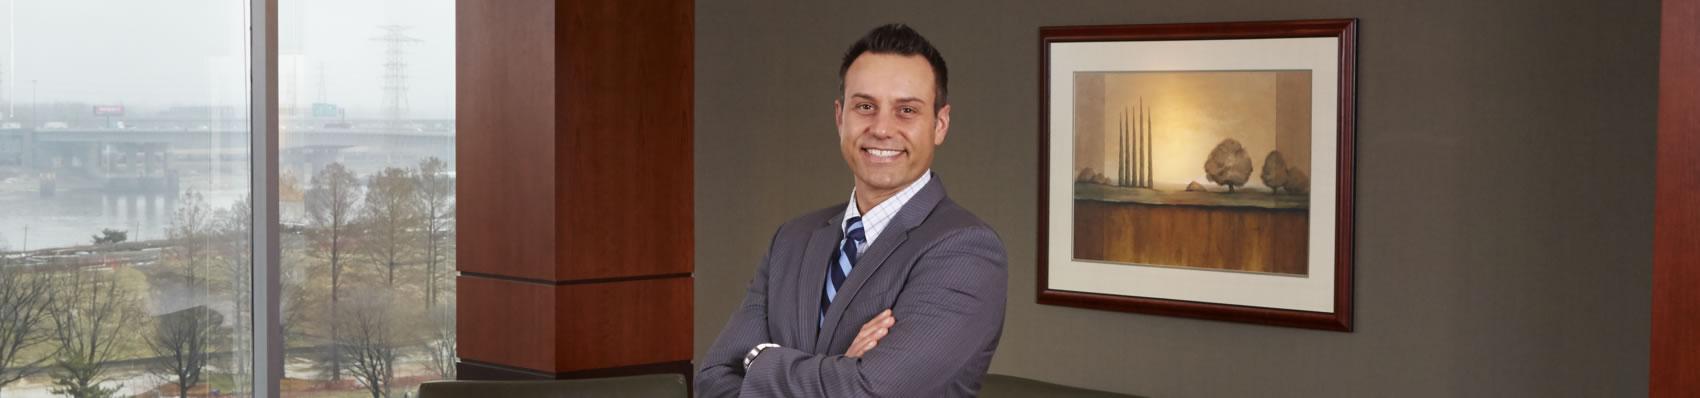 Josh Breithaupt, Principal at Pitzer Snodgrass, P.C.